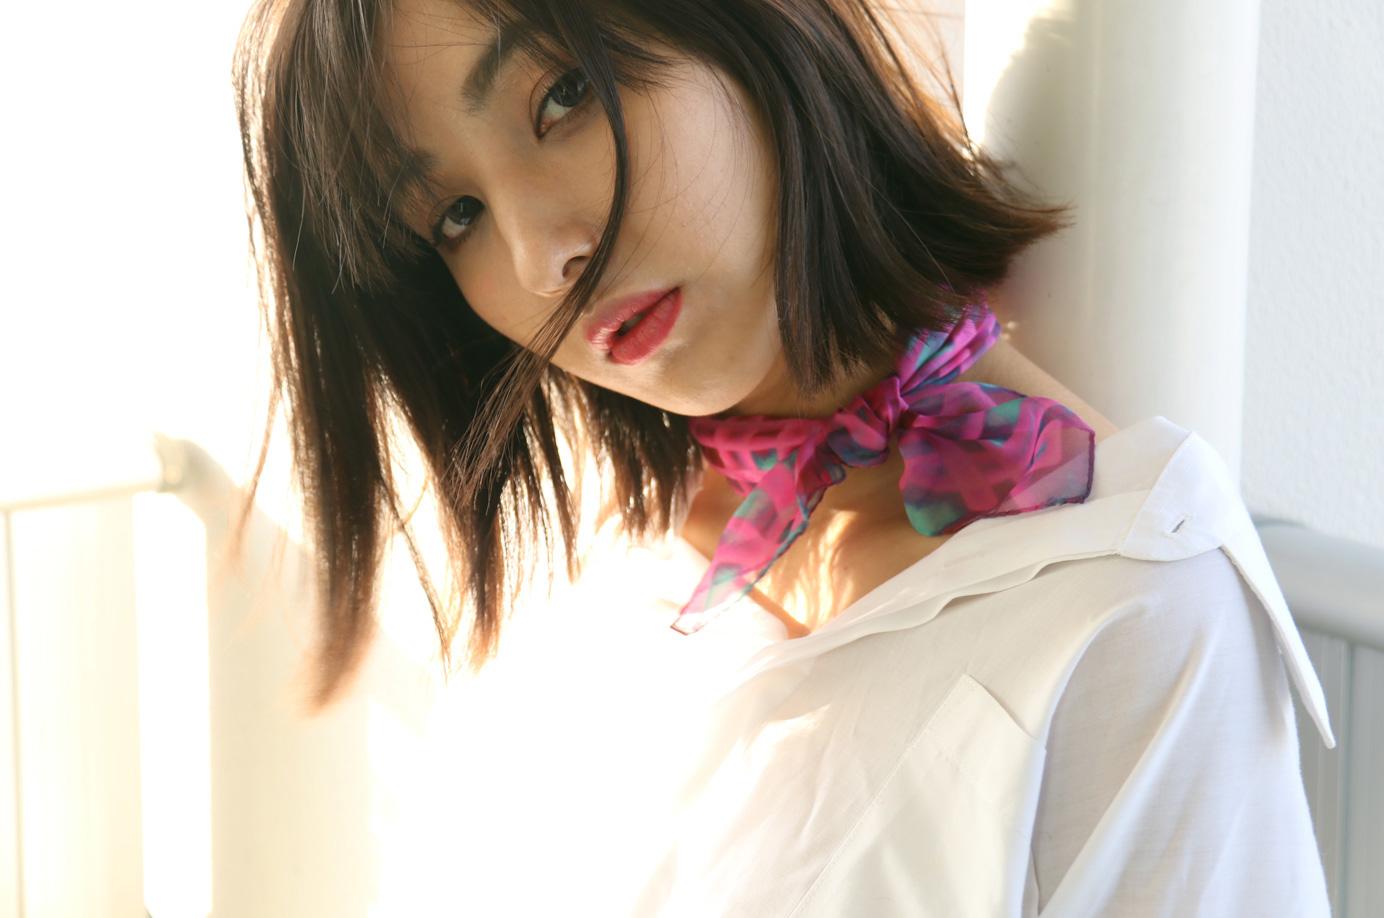 buy pink fashion silk scarf online in taipei tokyo paris. スカーフコーデ by bambi watanabe 渡辺万美; selfridges isetan barneys new york